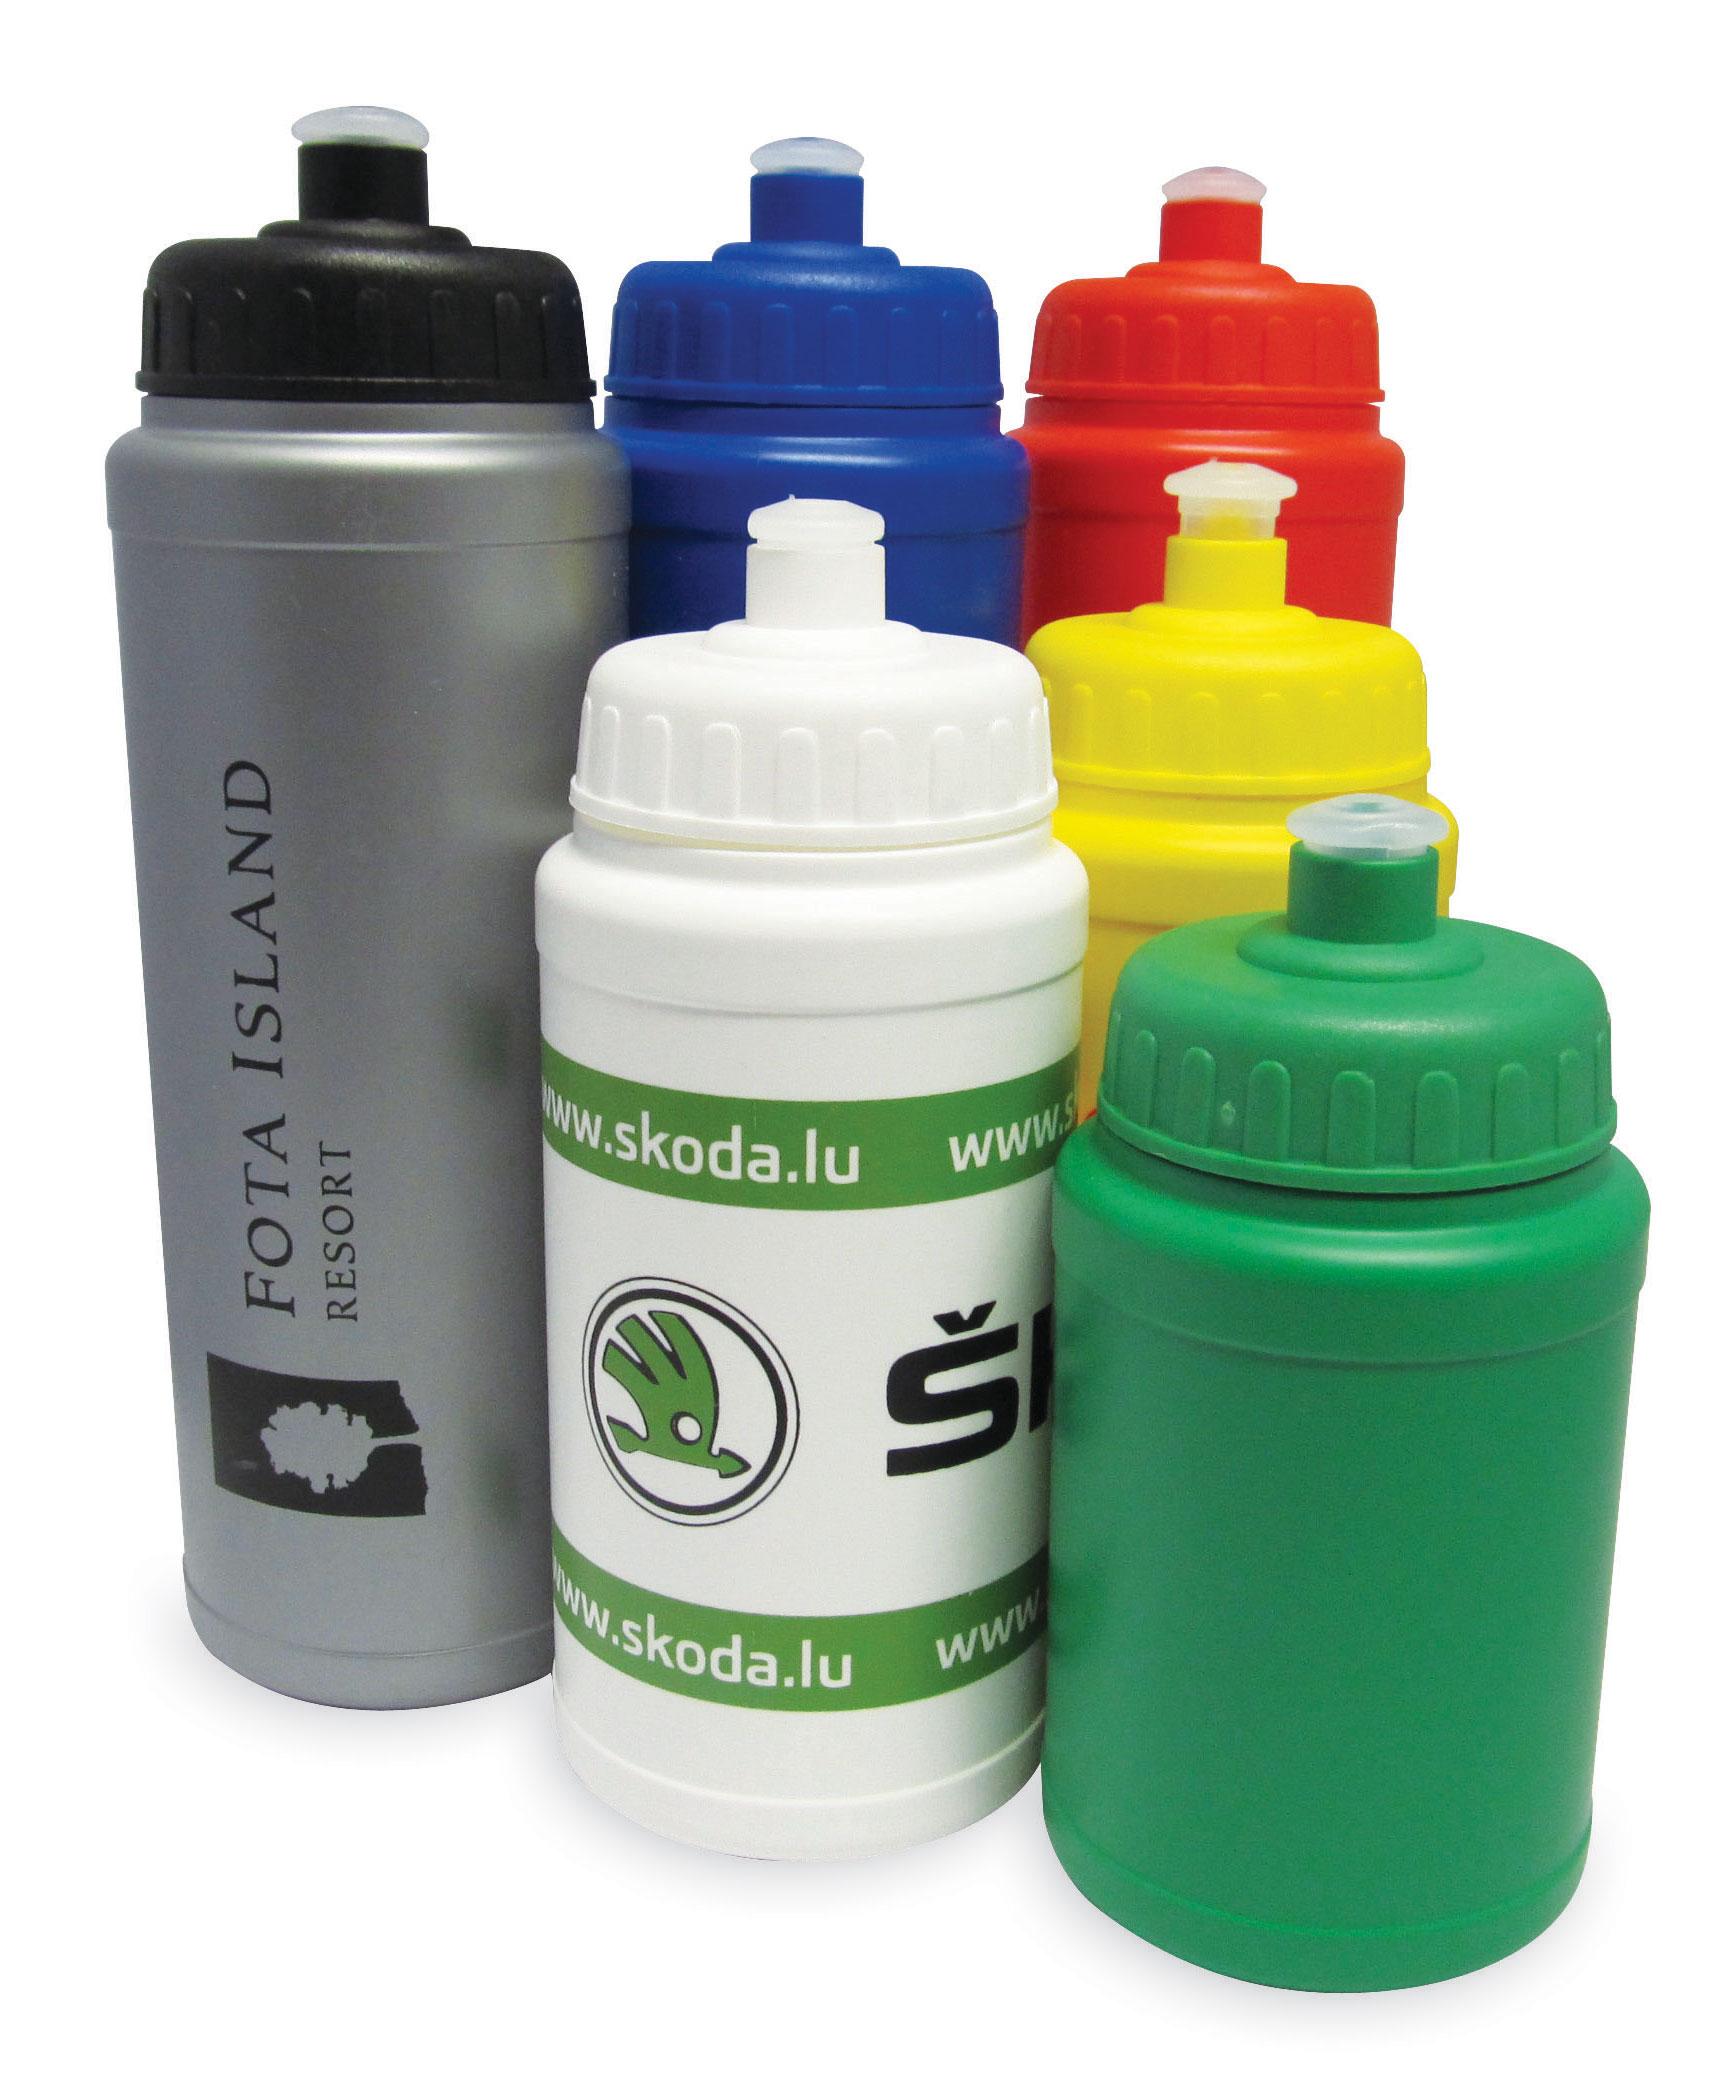 Promotional 750ml Baseline Bottle